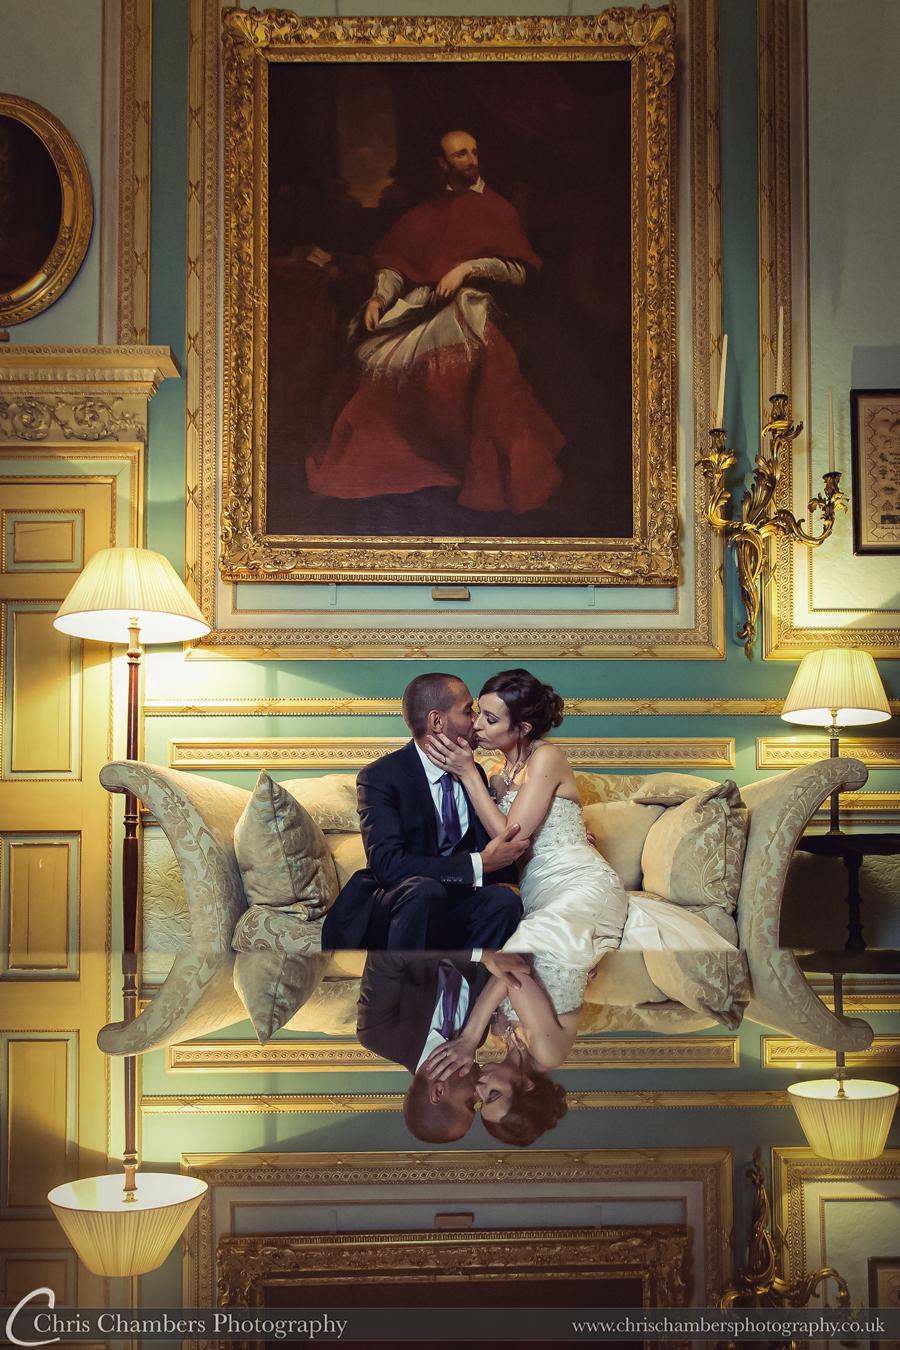 Swinton park wedding photographer, north Yorkshire weddings at Swinton park. Award winning wedding photography from Chris Chambers, Swinton Park Wedding Photographer